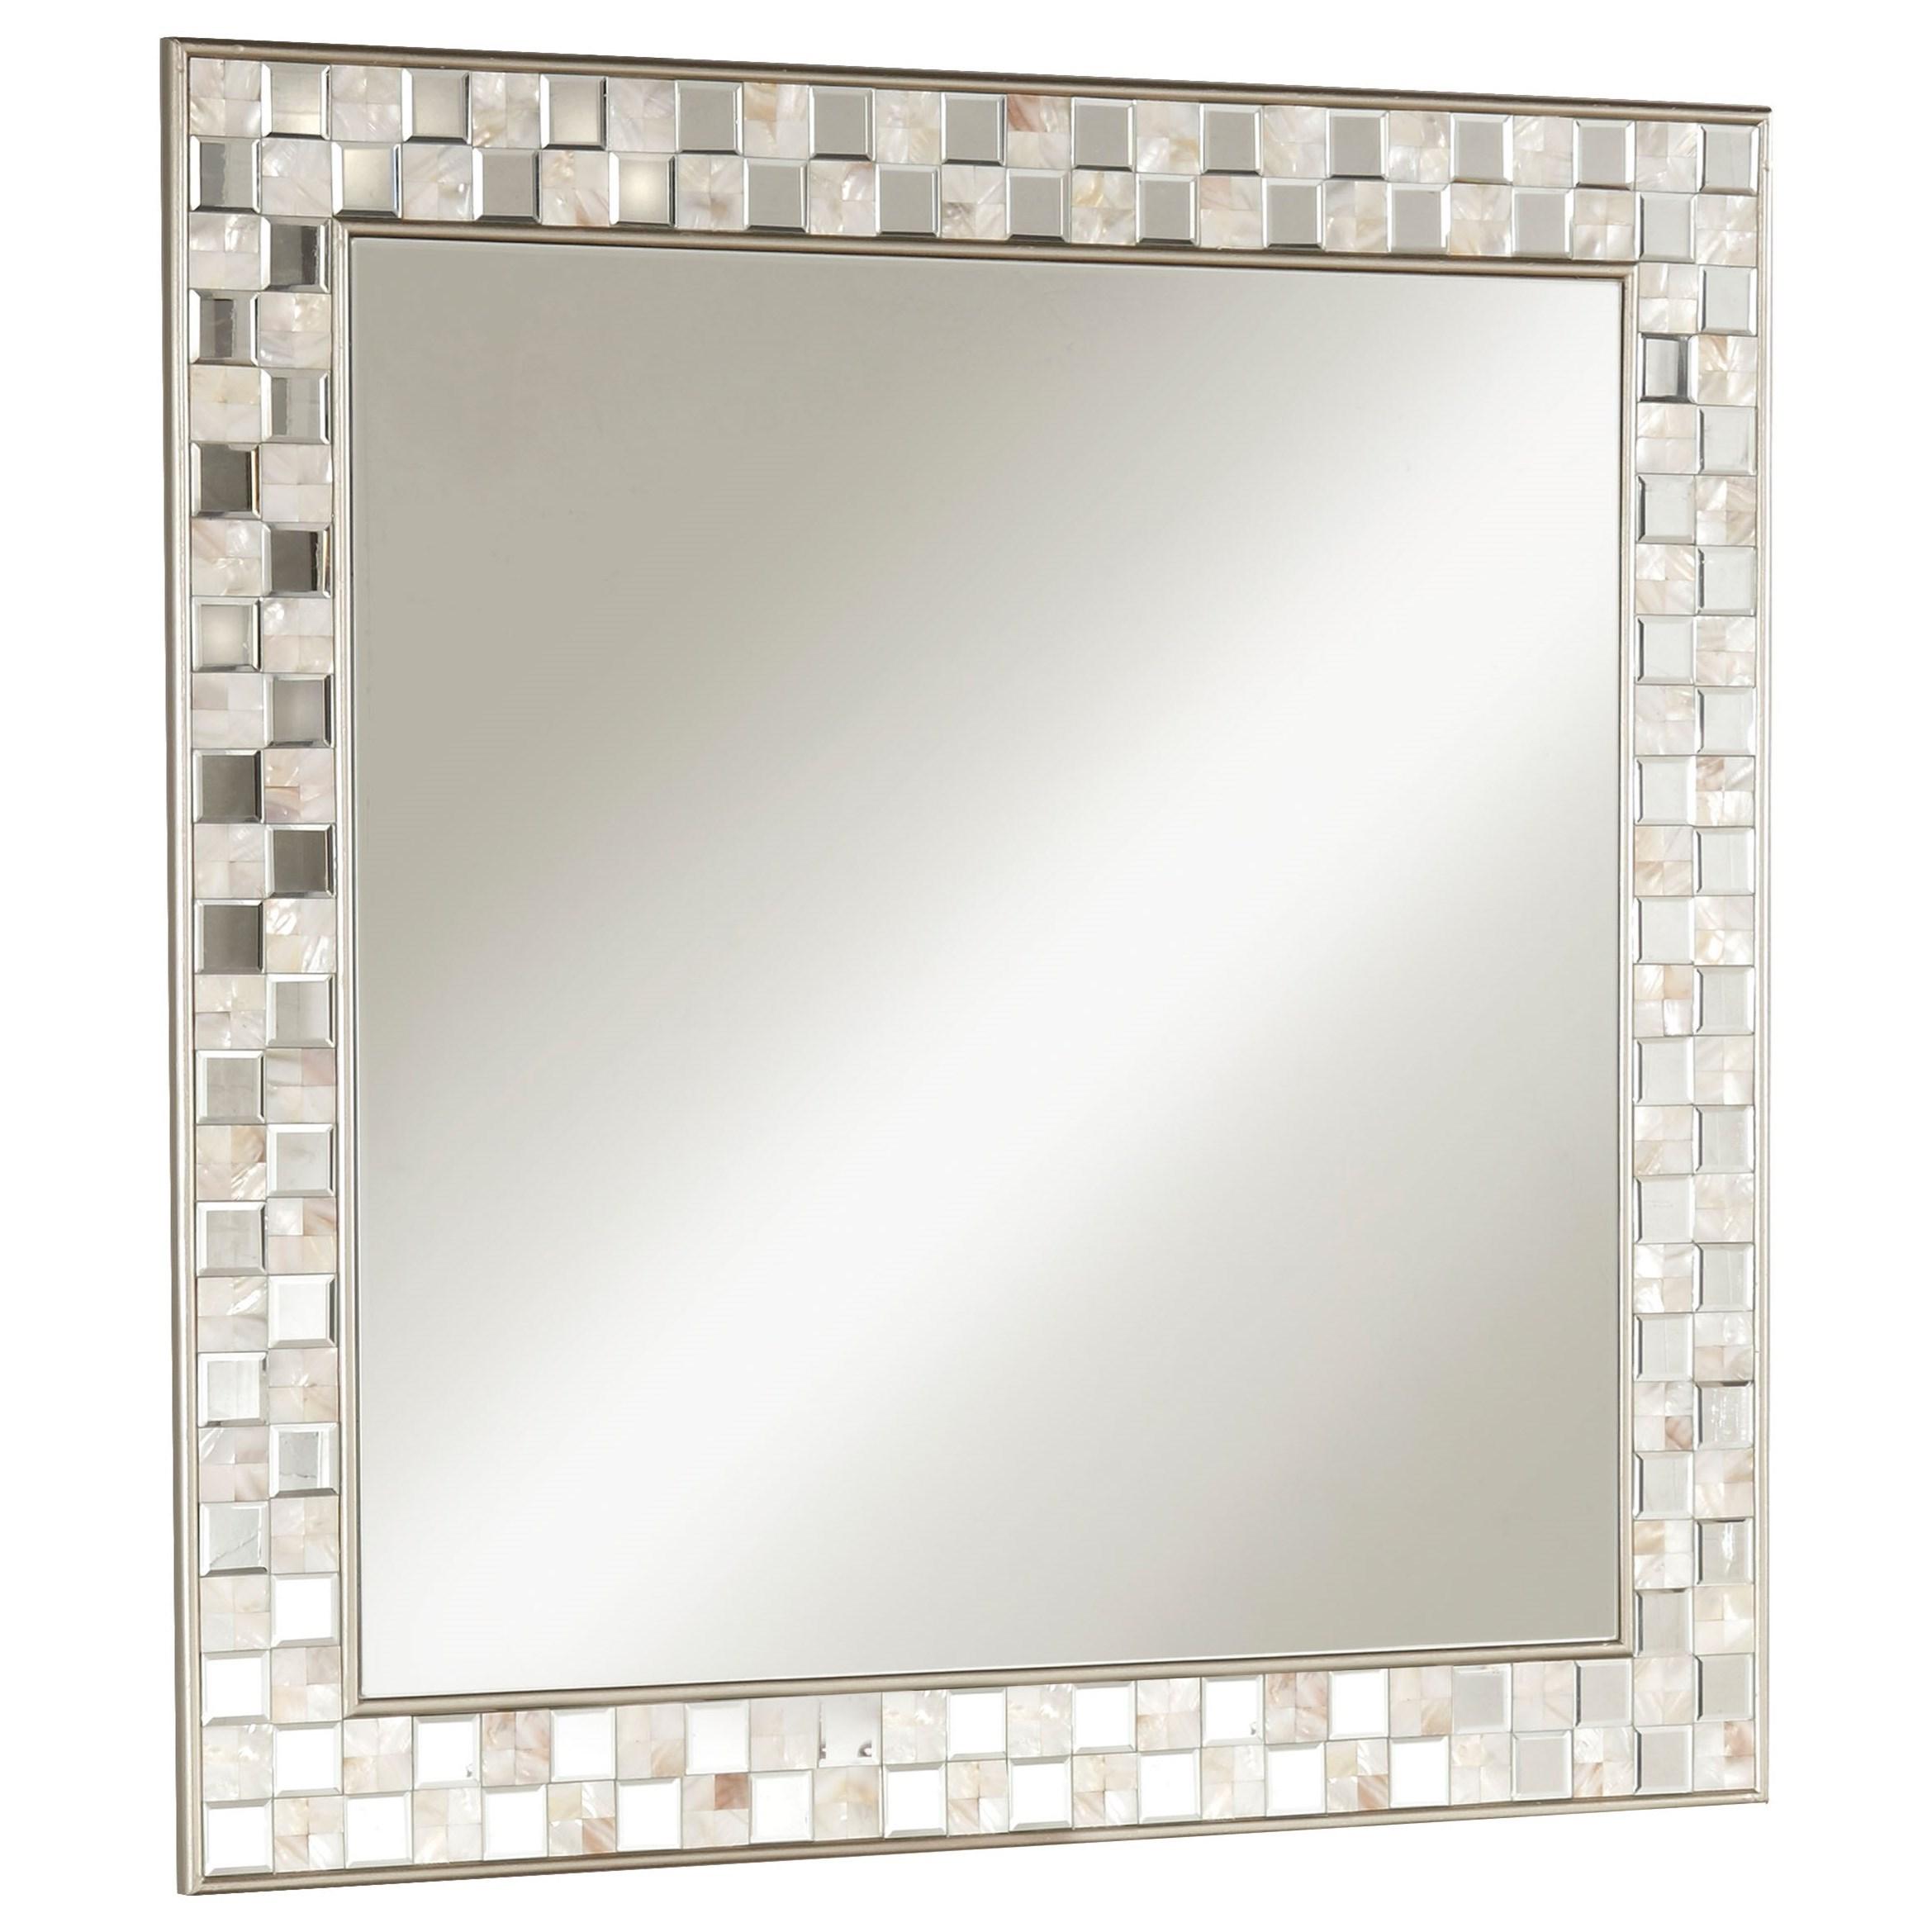 Acme Furniture 97388 Nasa Mirror Trim Square Accent Wall Mirror: Acme Furniture Nasa 97388 Glam Wall Mirror With Tile